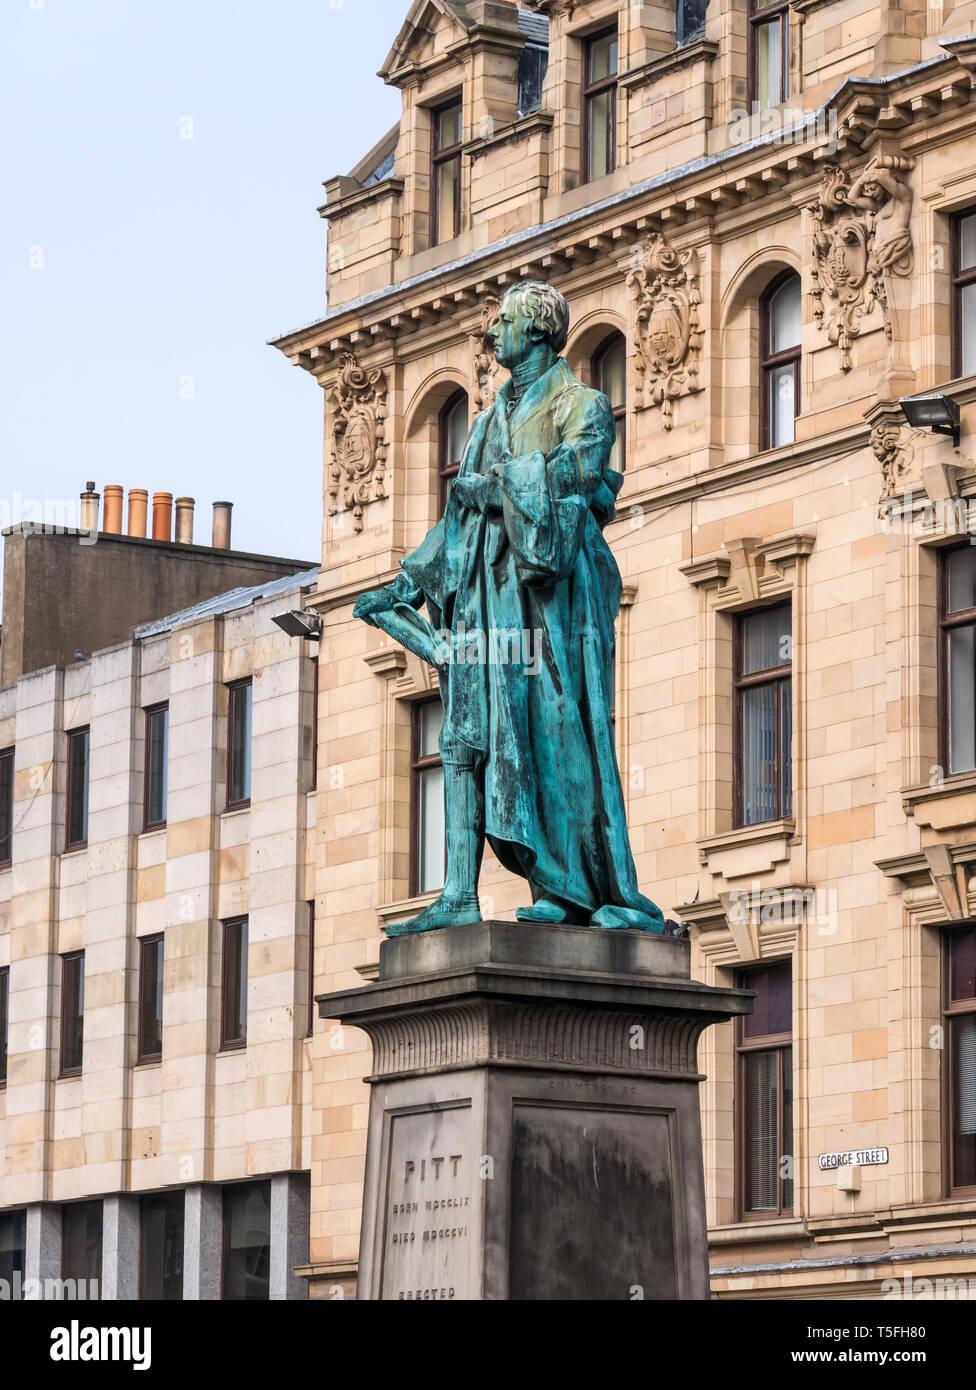 William Pitt the Younger bronze statue by Sir Francis Chantrey, George Street, Edinburgh New Town, Scotland, UK - Stock Image